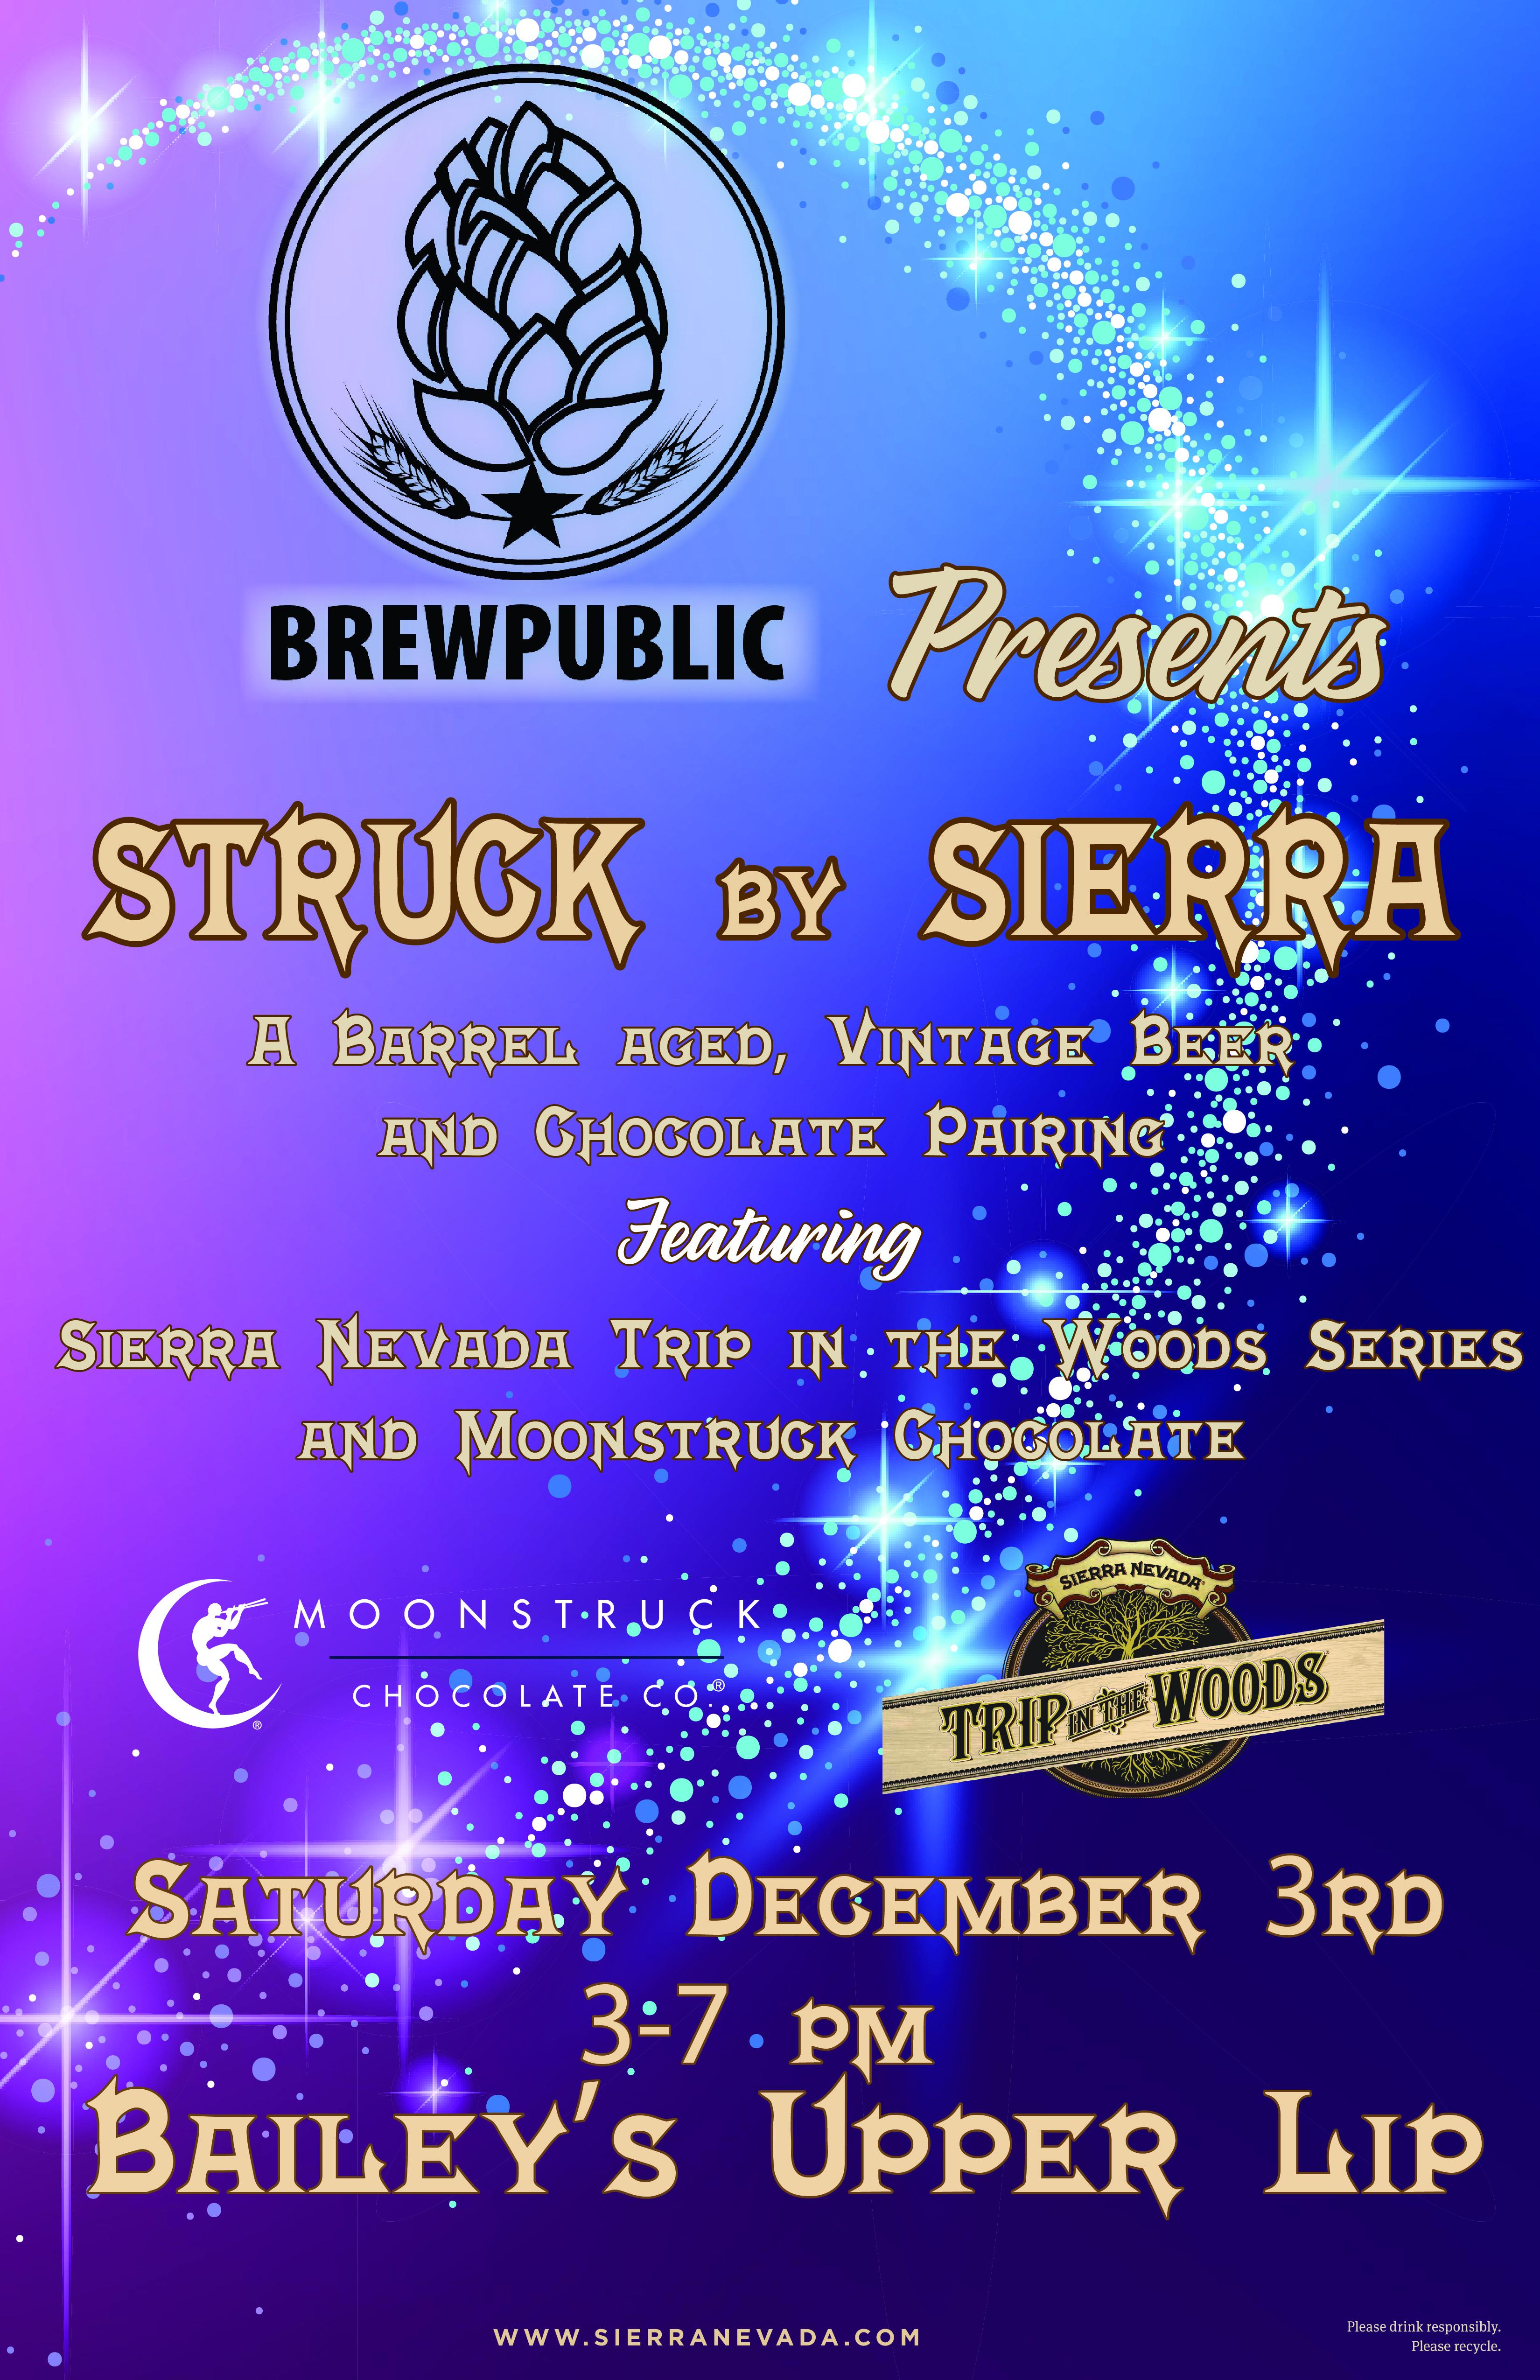 struck-on-sierra-nevada